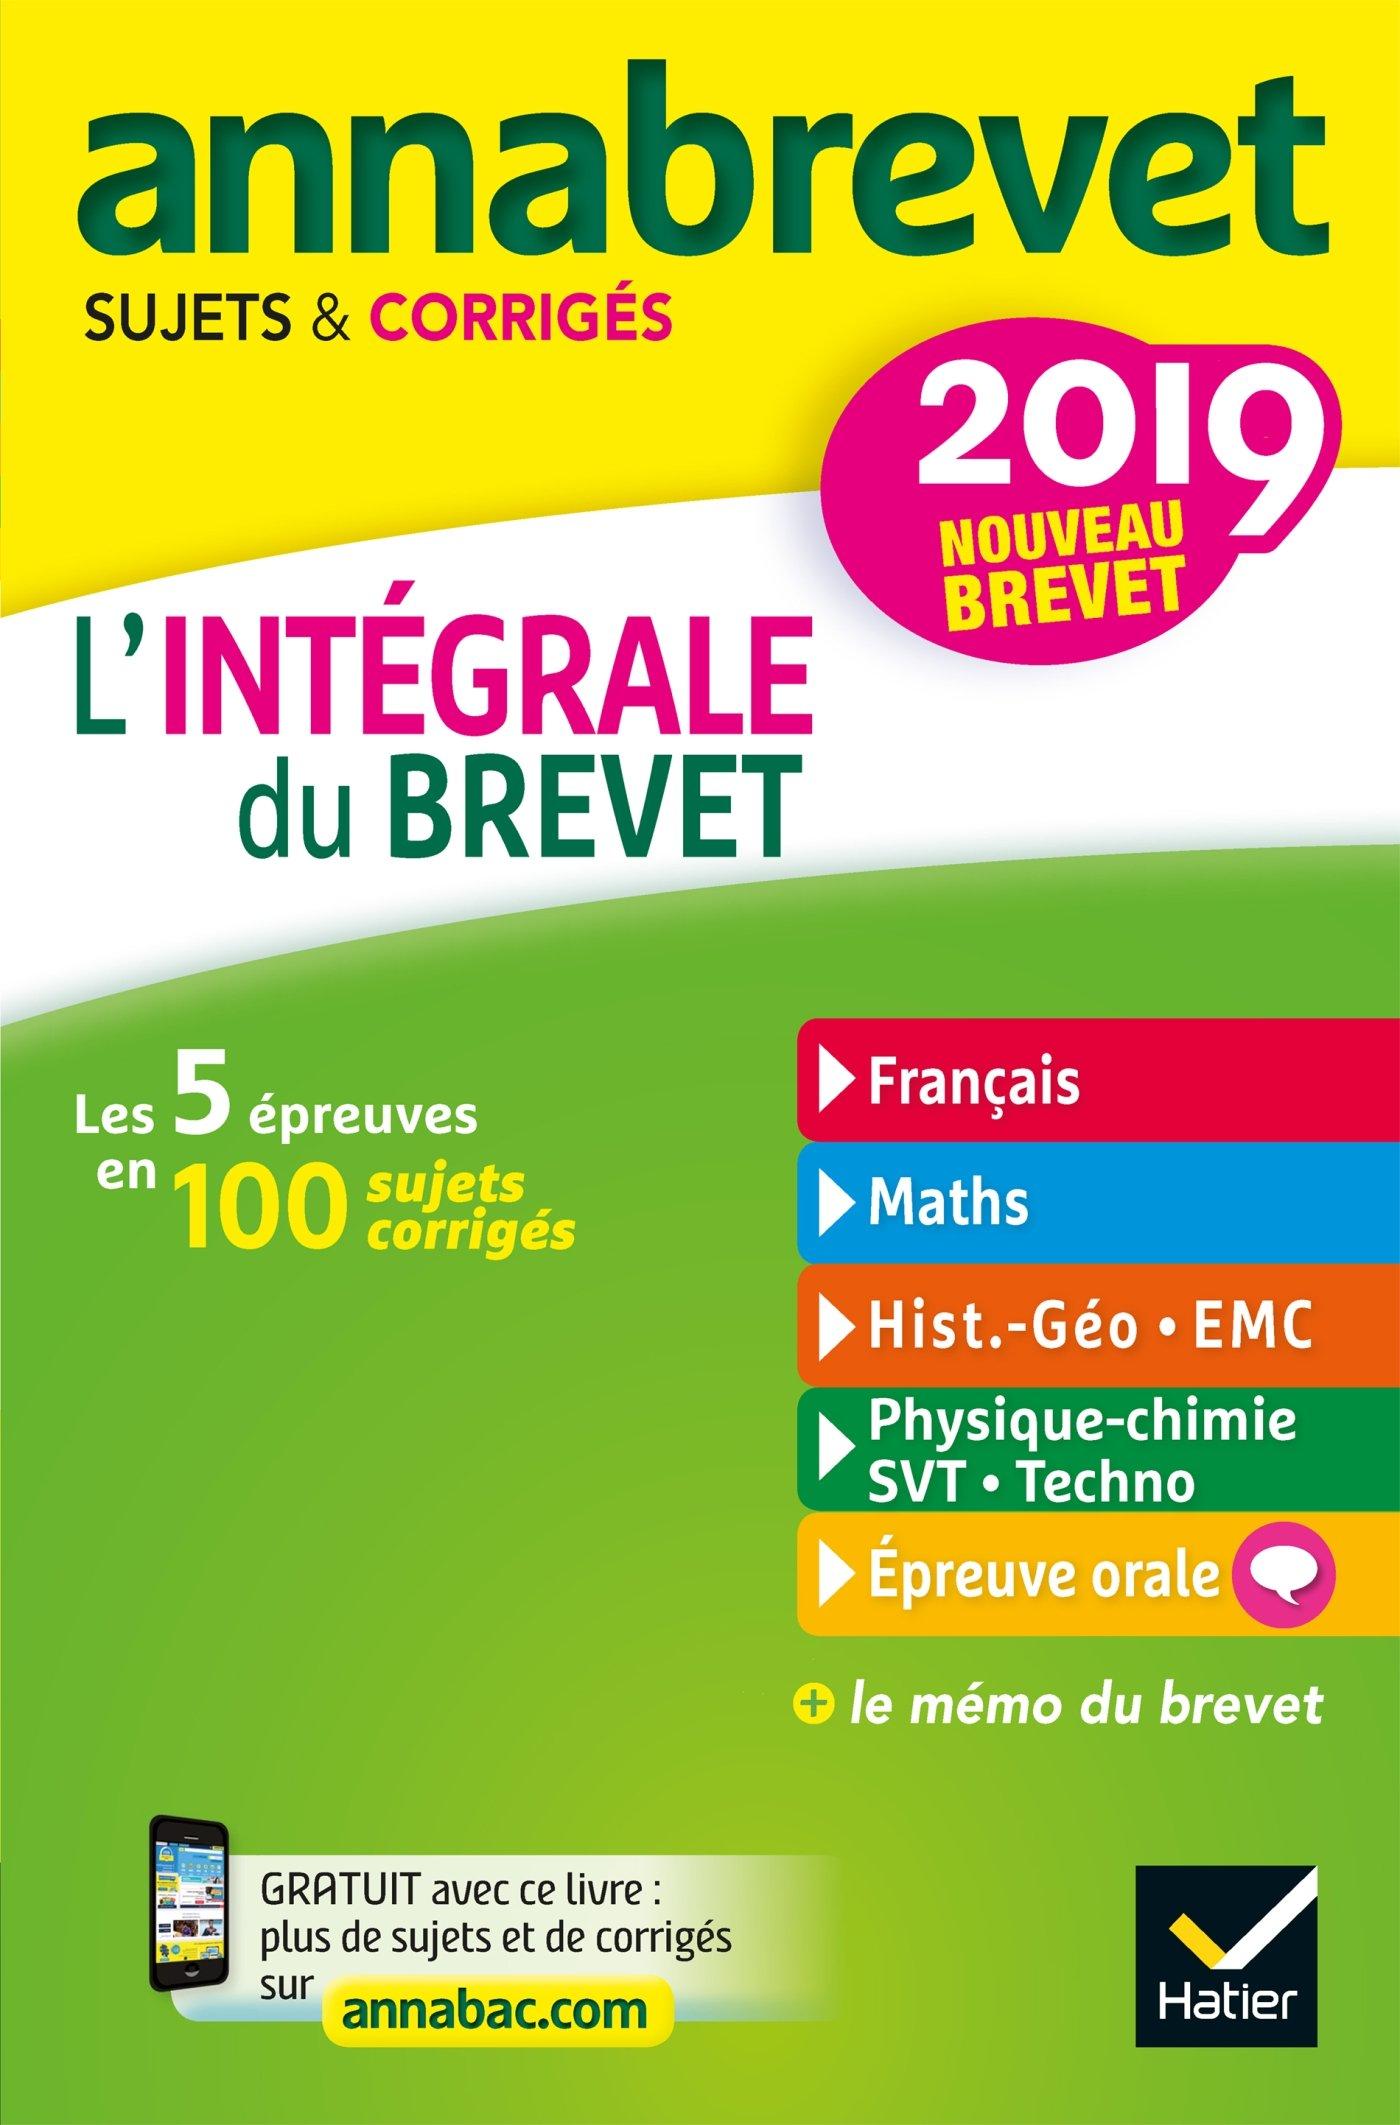 Annales Annabrevet 2019